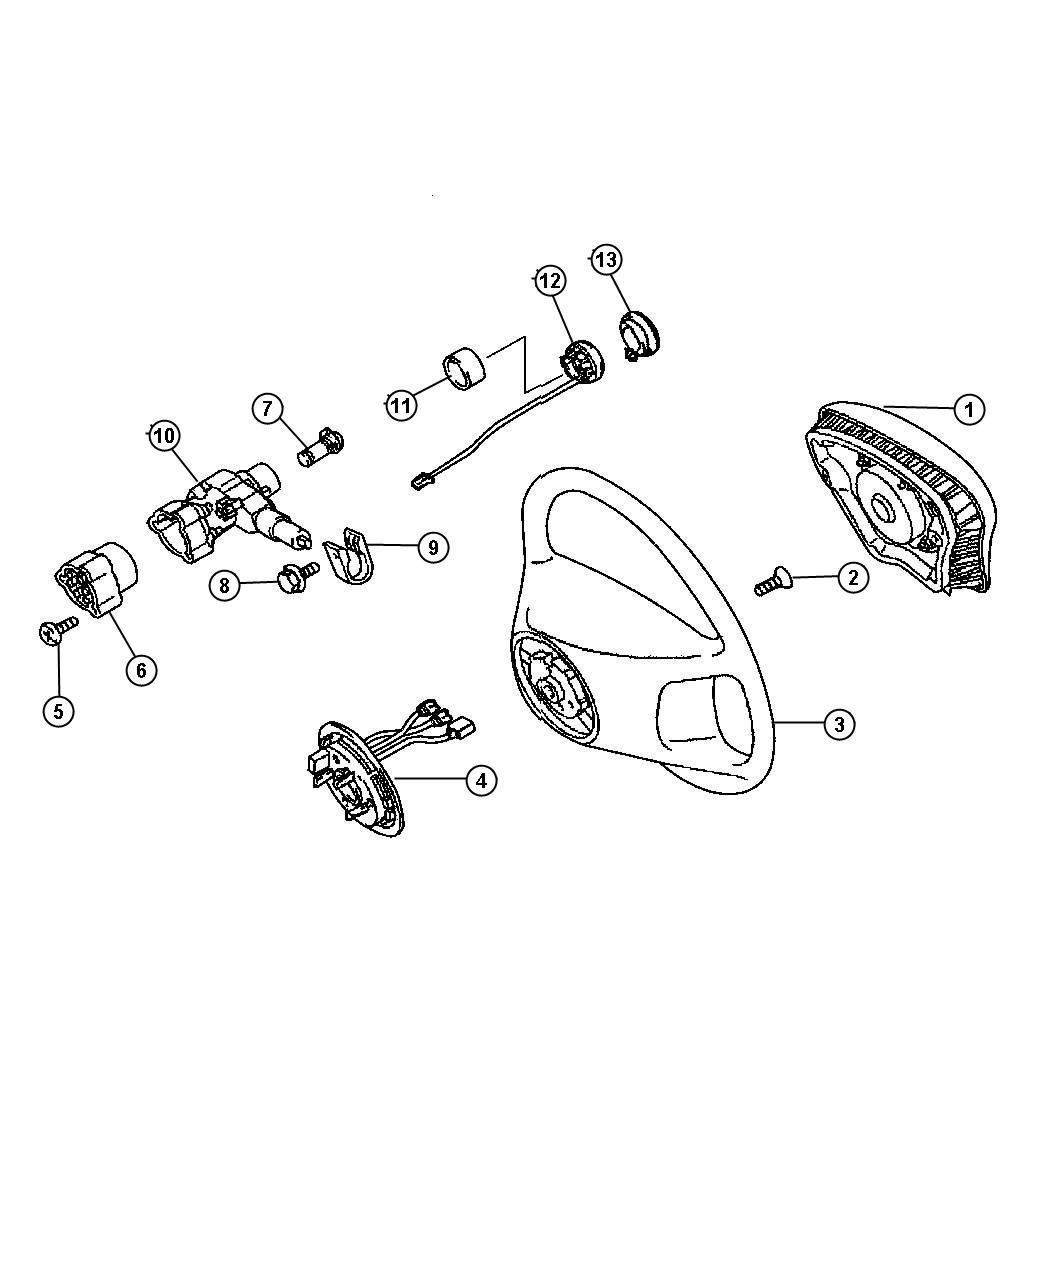 Chrysler Crossfire Sleeve. Steering linkage. Convertible